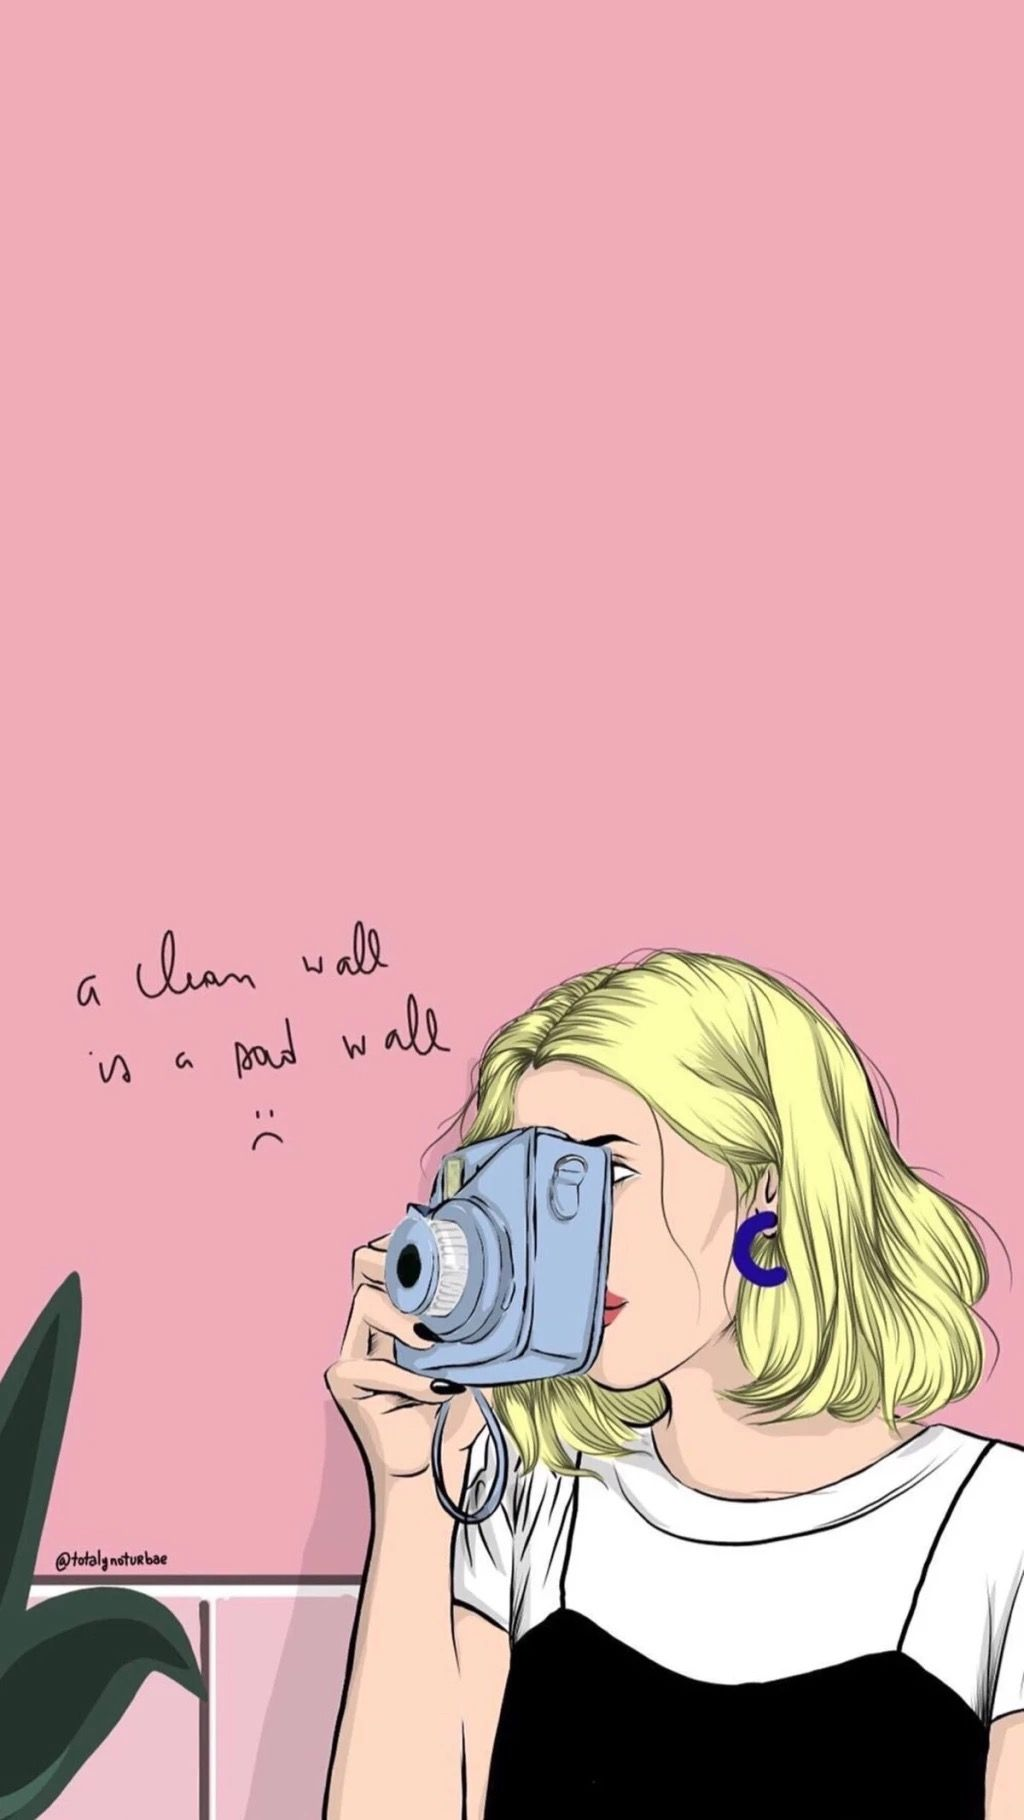 Iphone wallpaper, Girl wallpaper, Cute ...